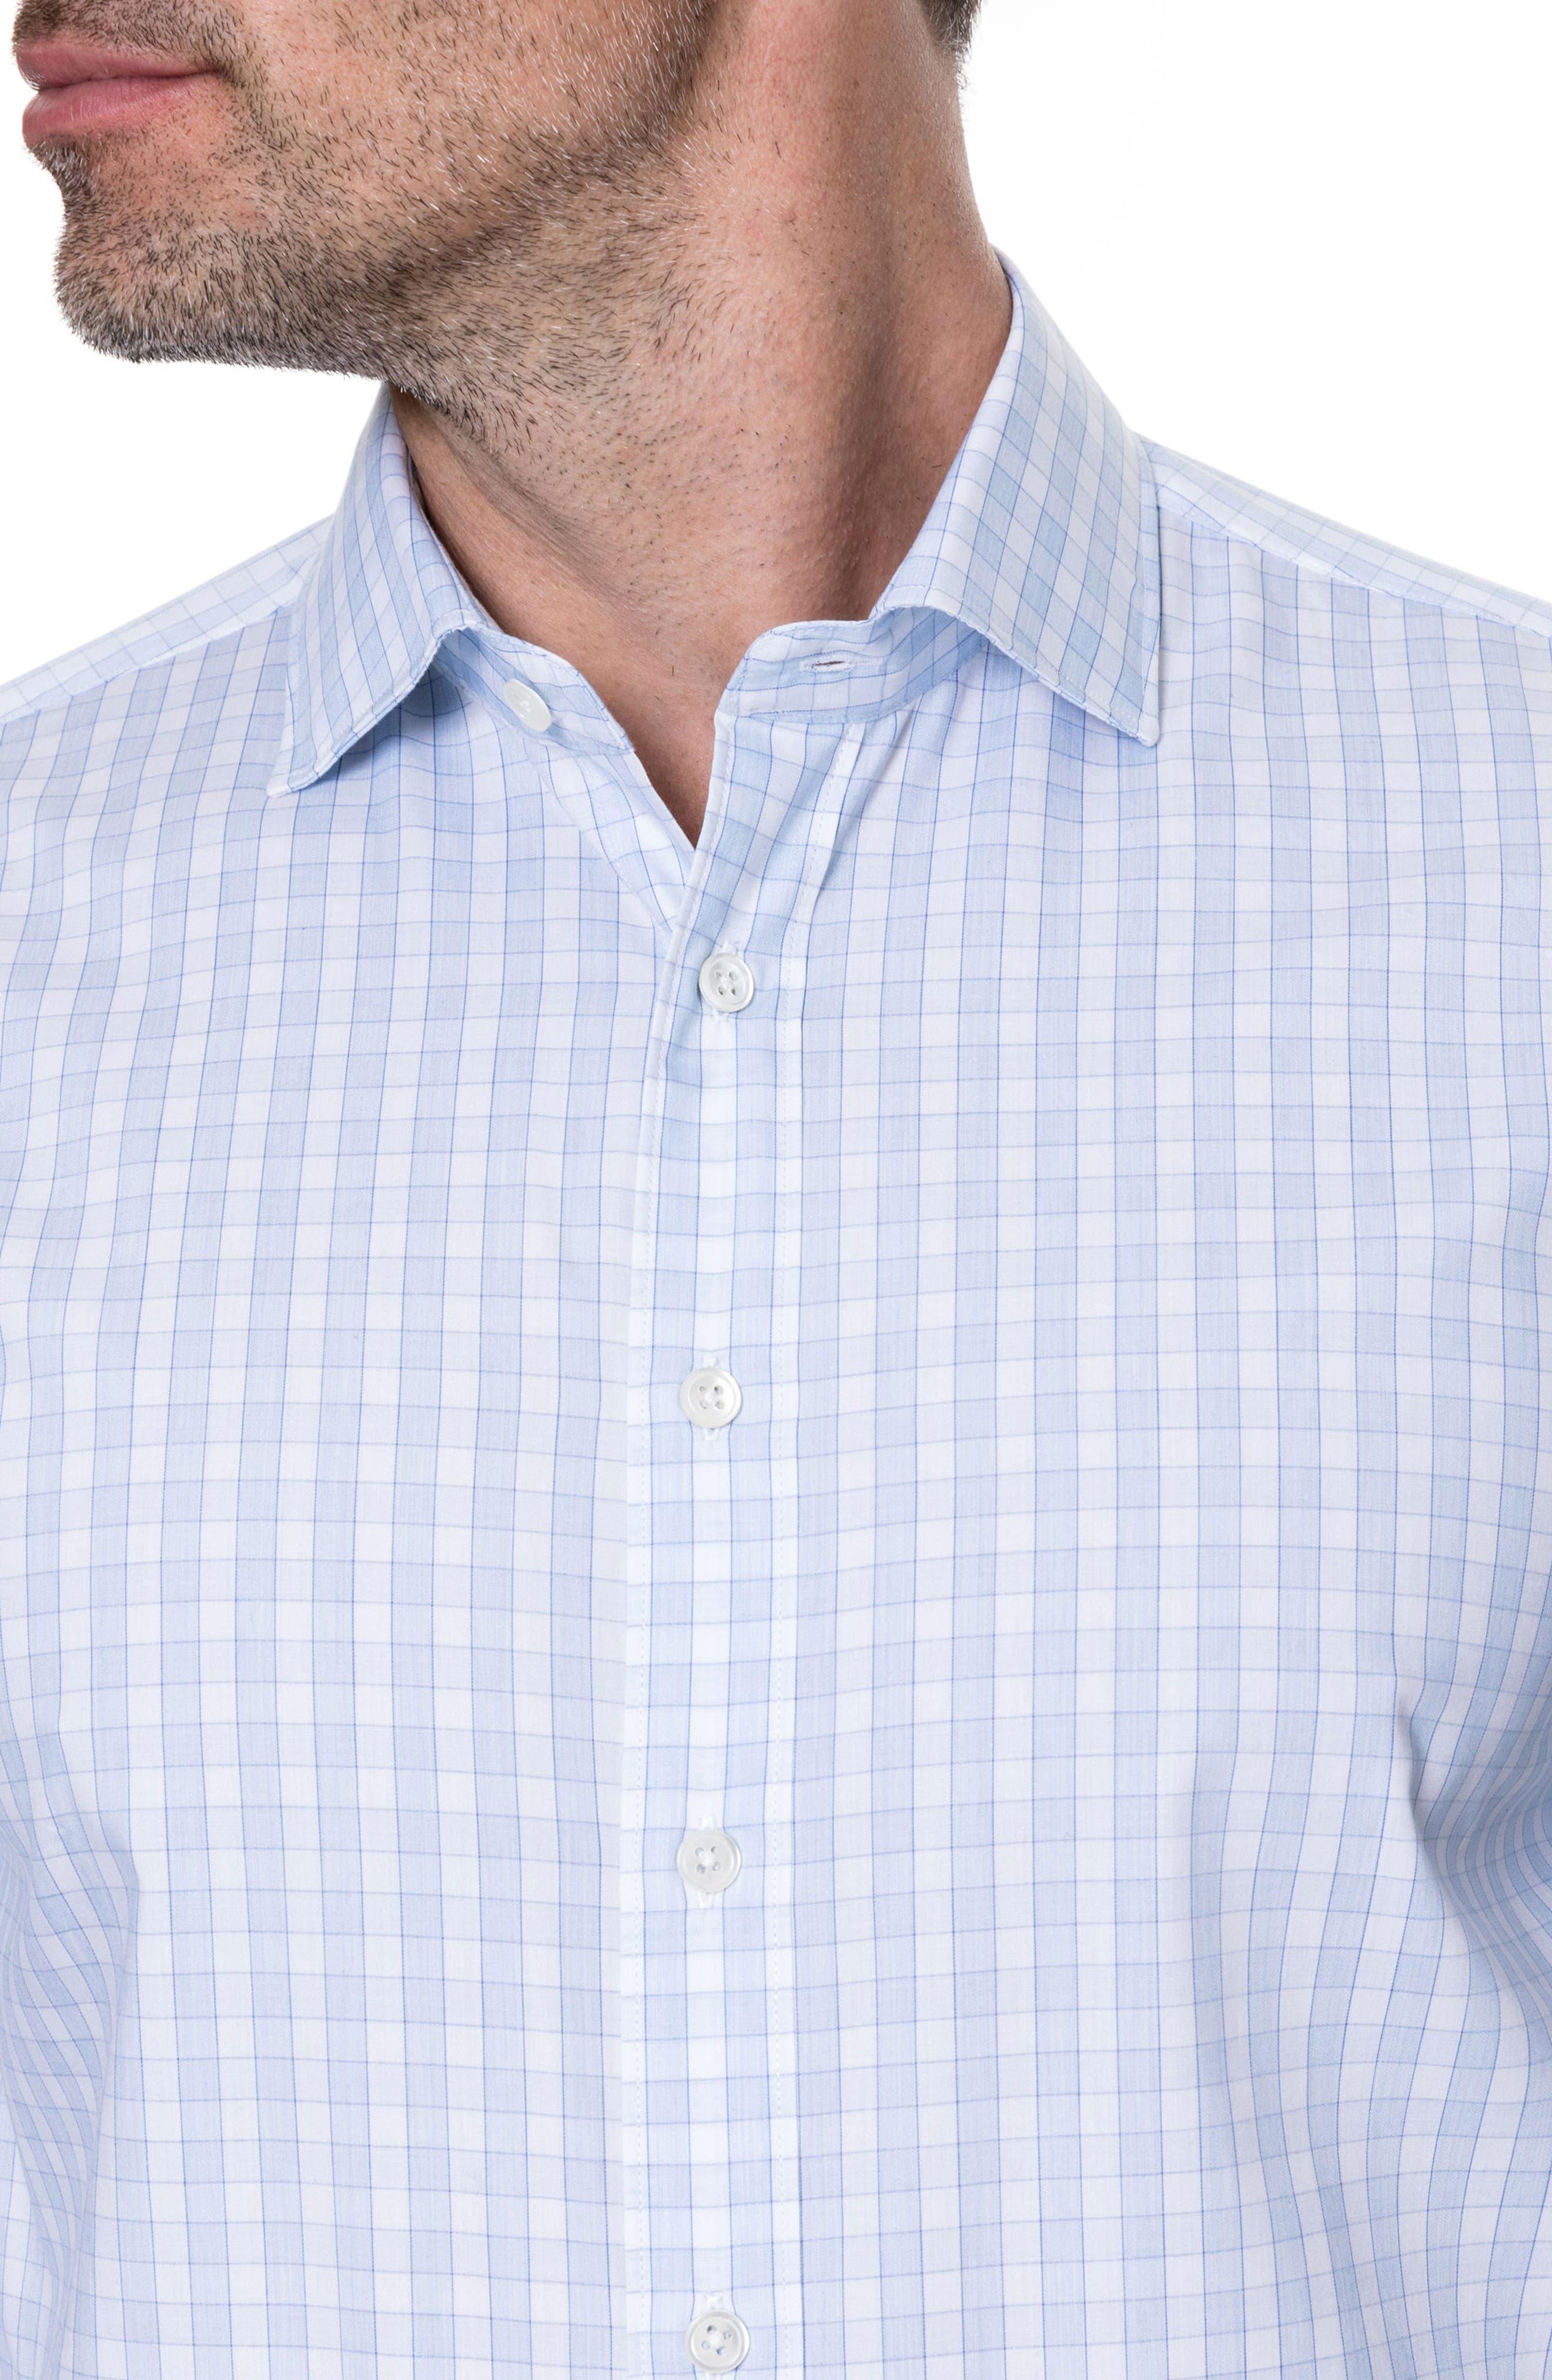 Brackley Slim Fit Sport Shirt,                             Alternate thumbnail 2, color,                             Sky